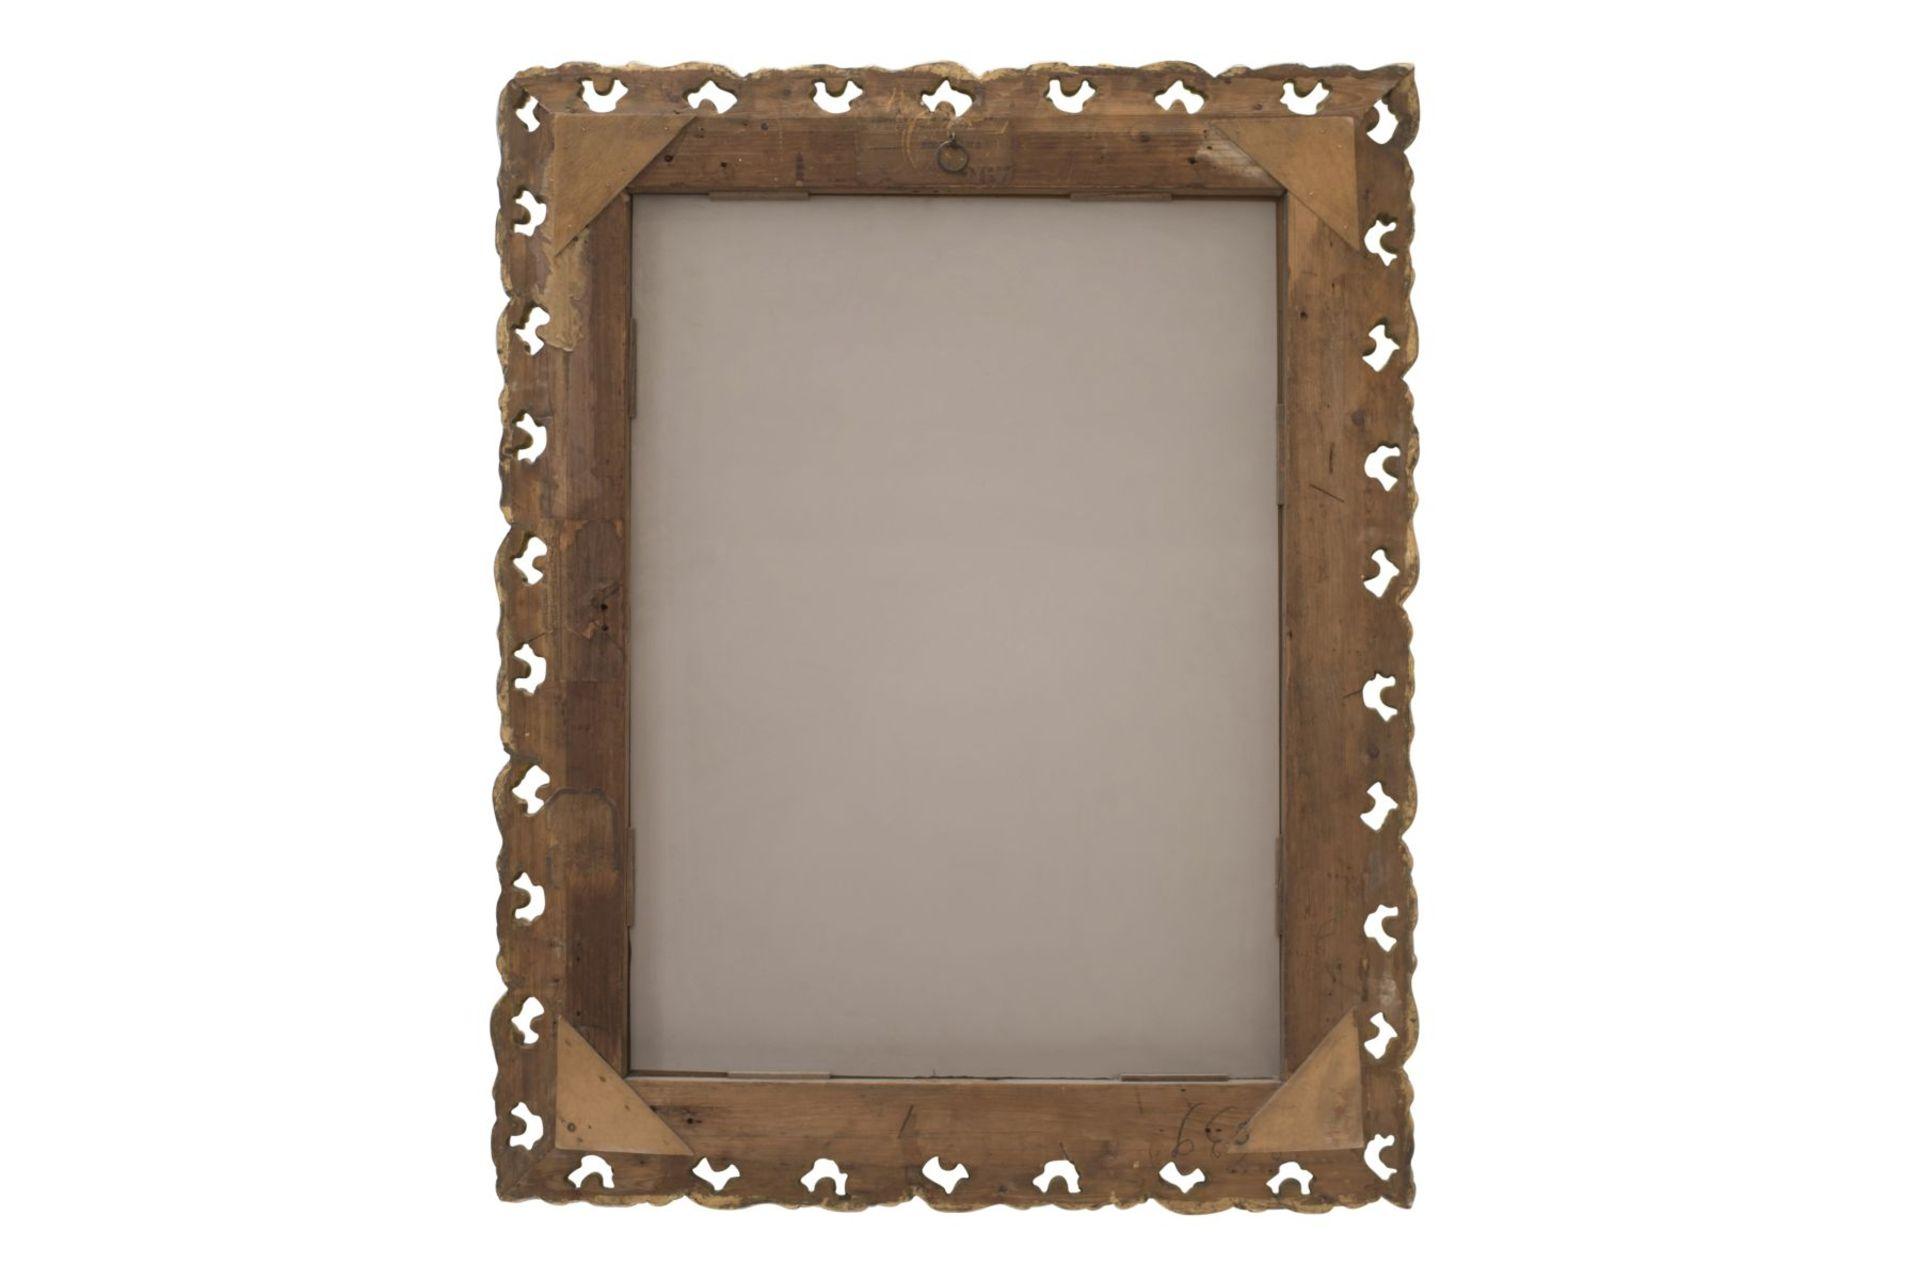 Decorative mirror - Image 5 of 5